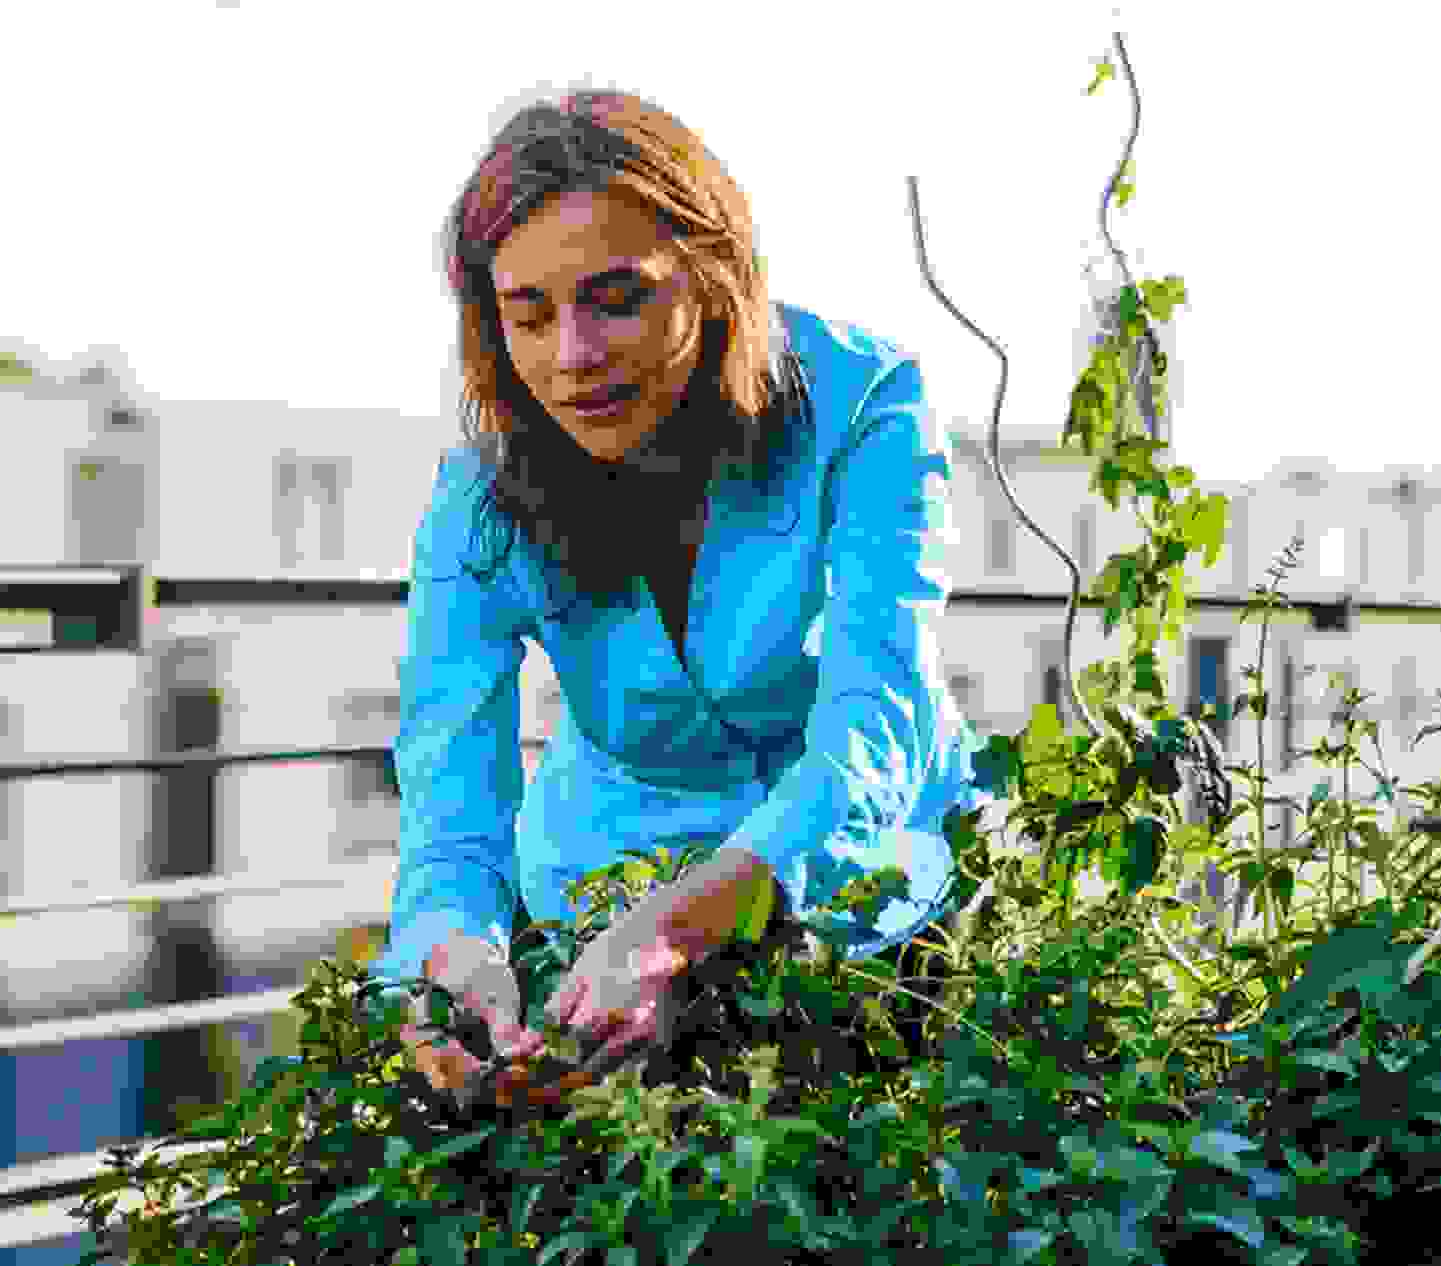 Gartenprojekte selber machen »